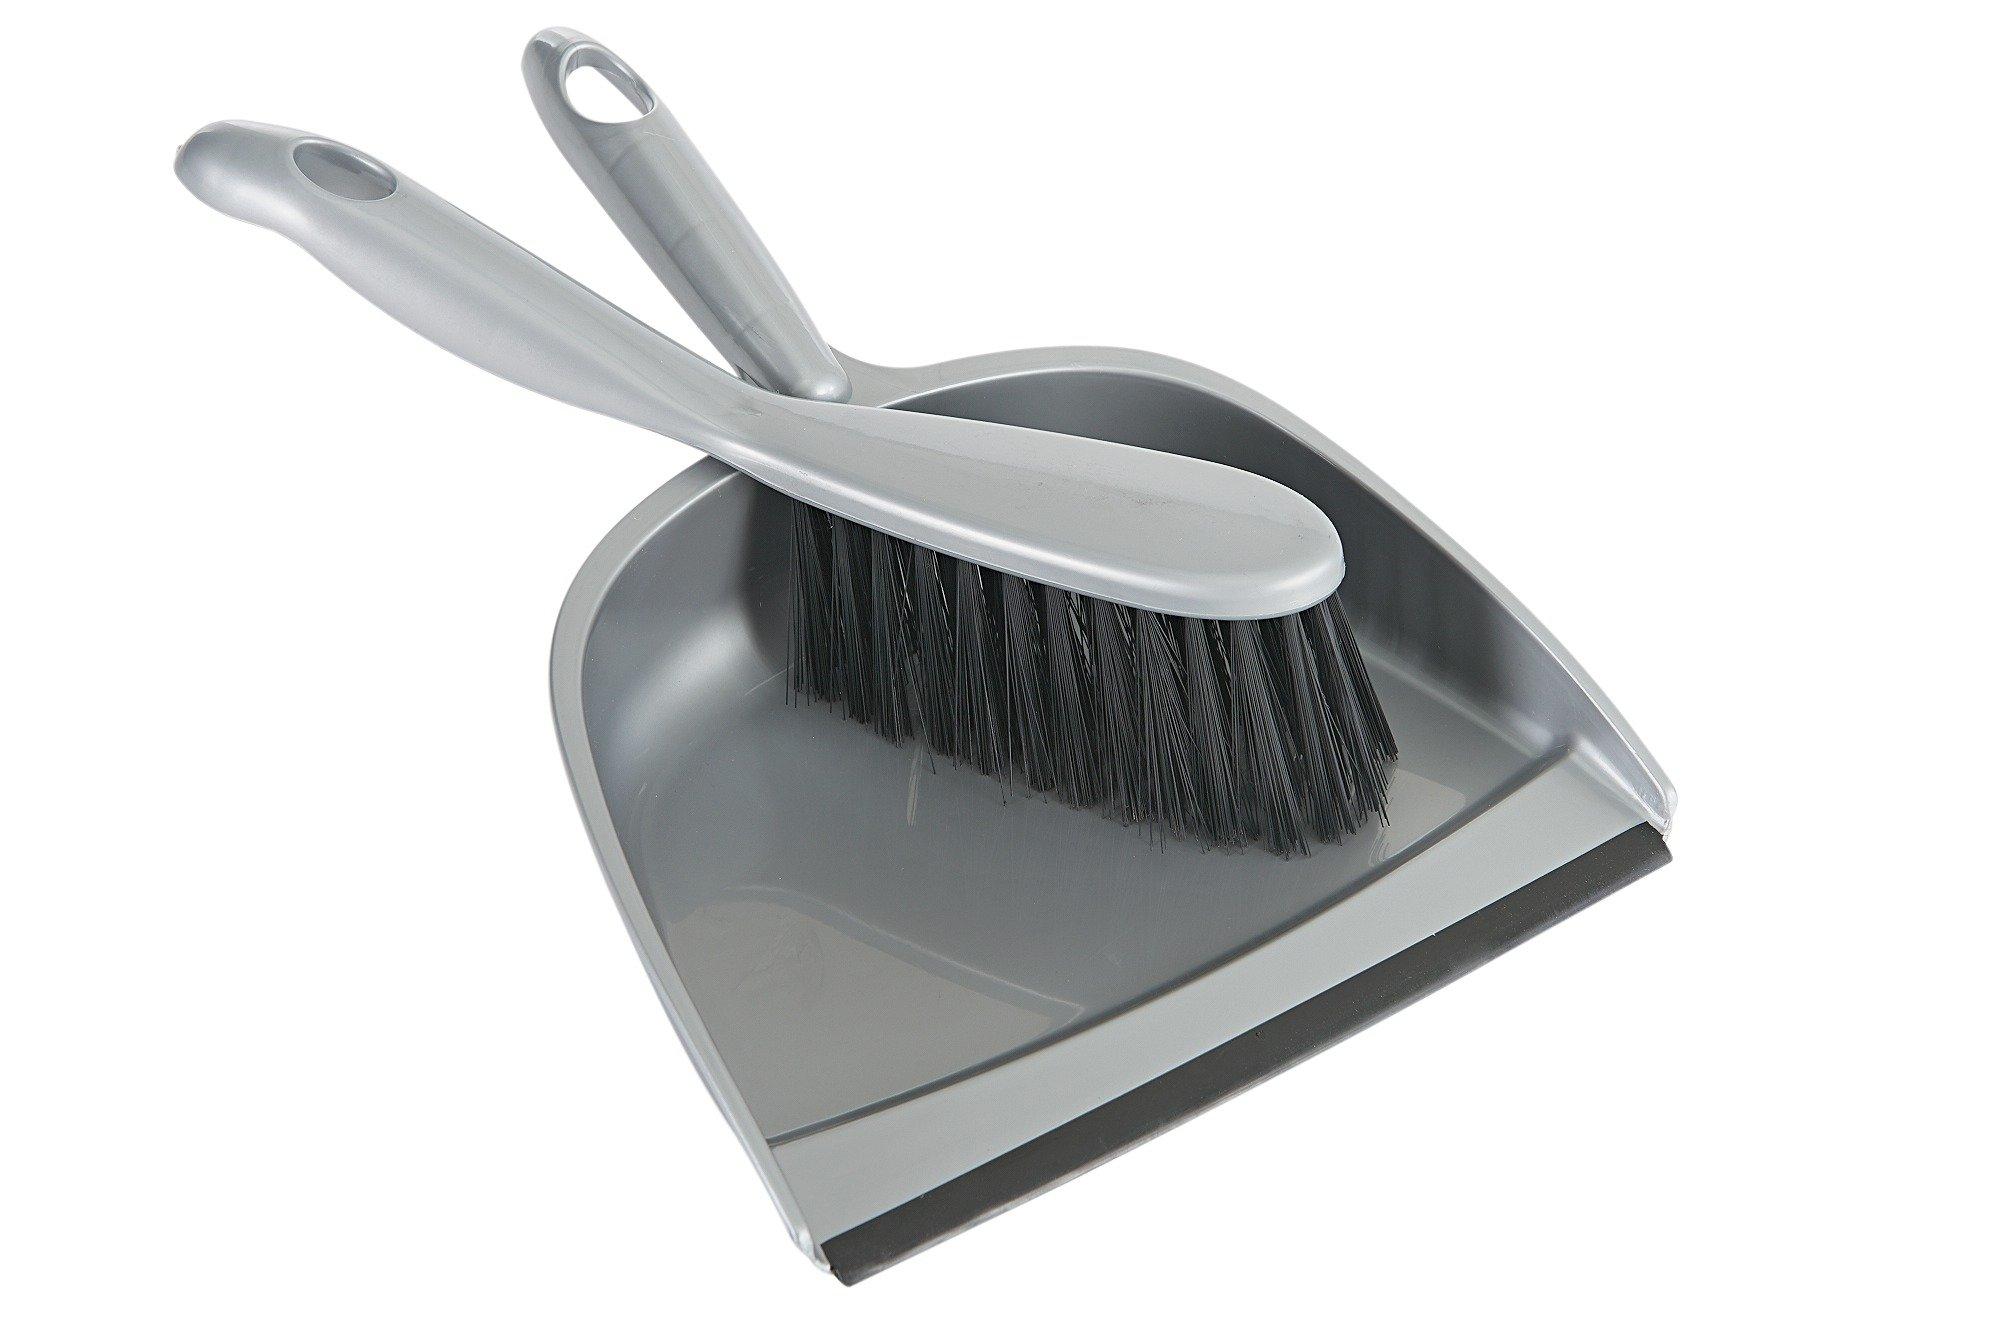 Image of Bentley Dustpan & Brush Set